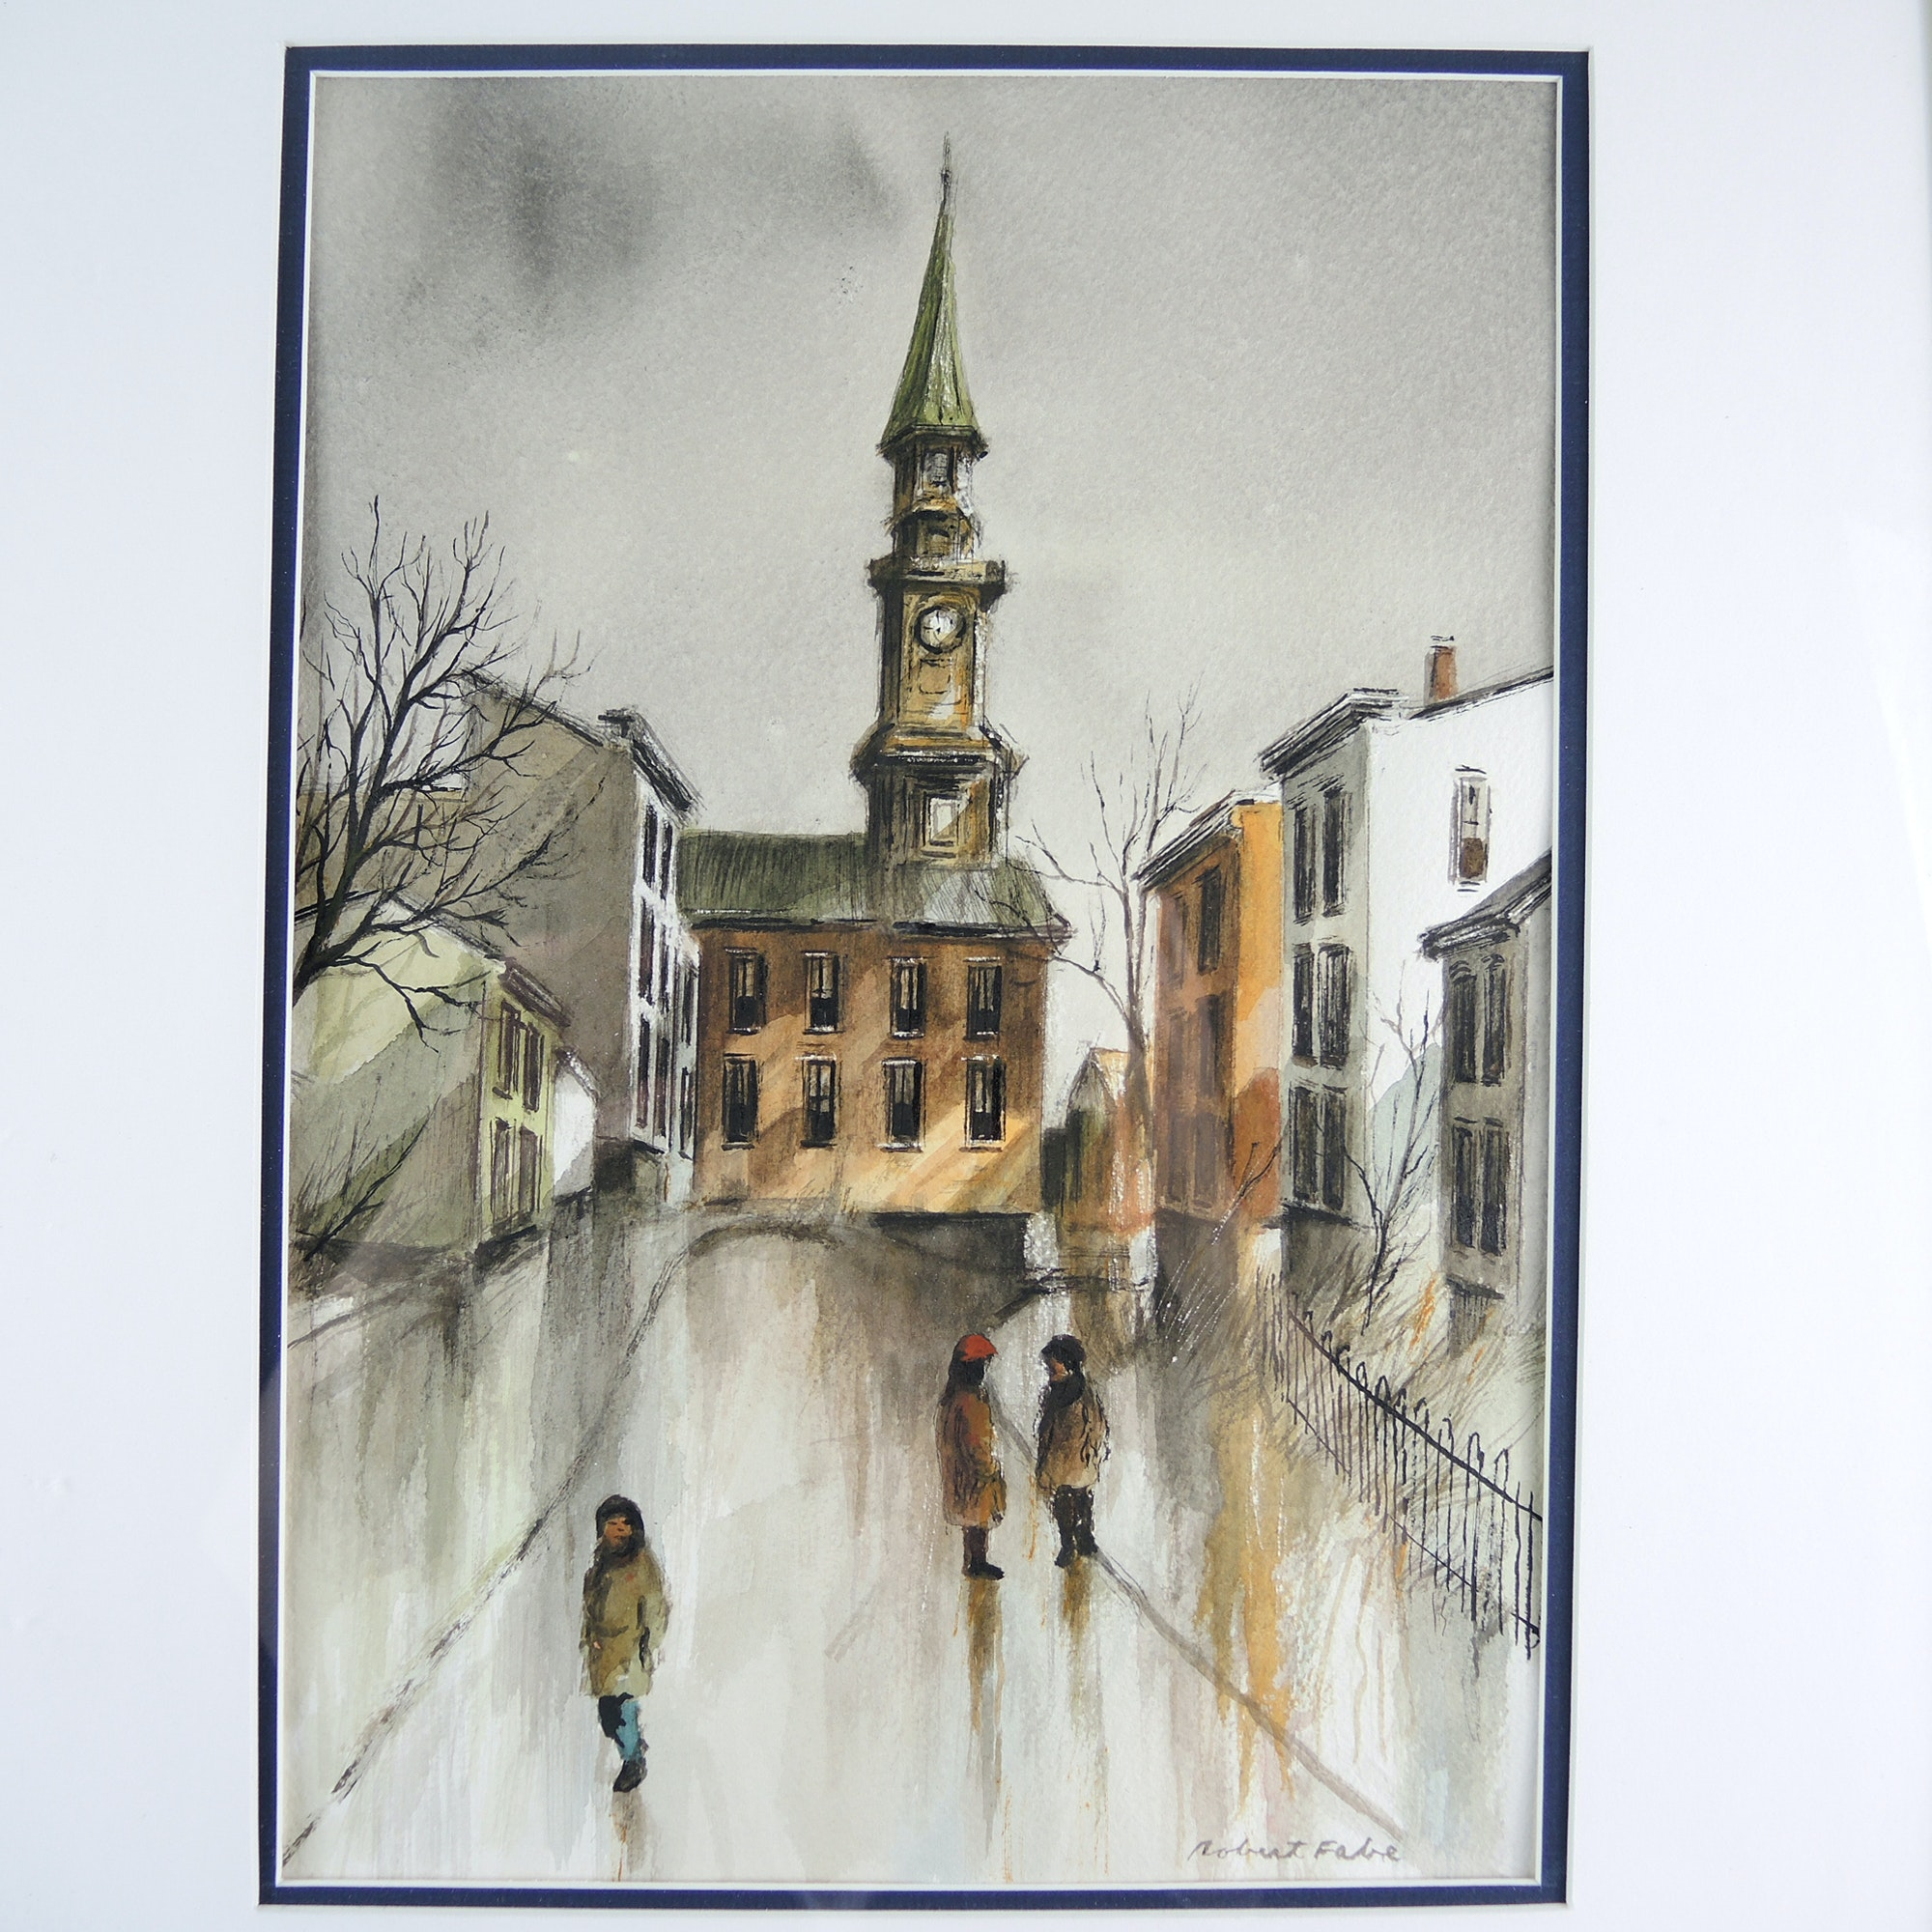 Robert Fabe Original Signed Painting